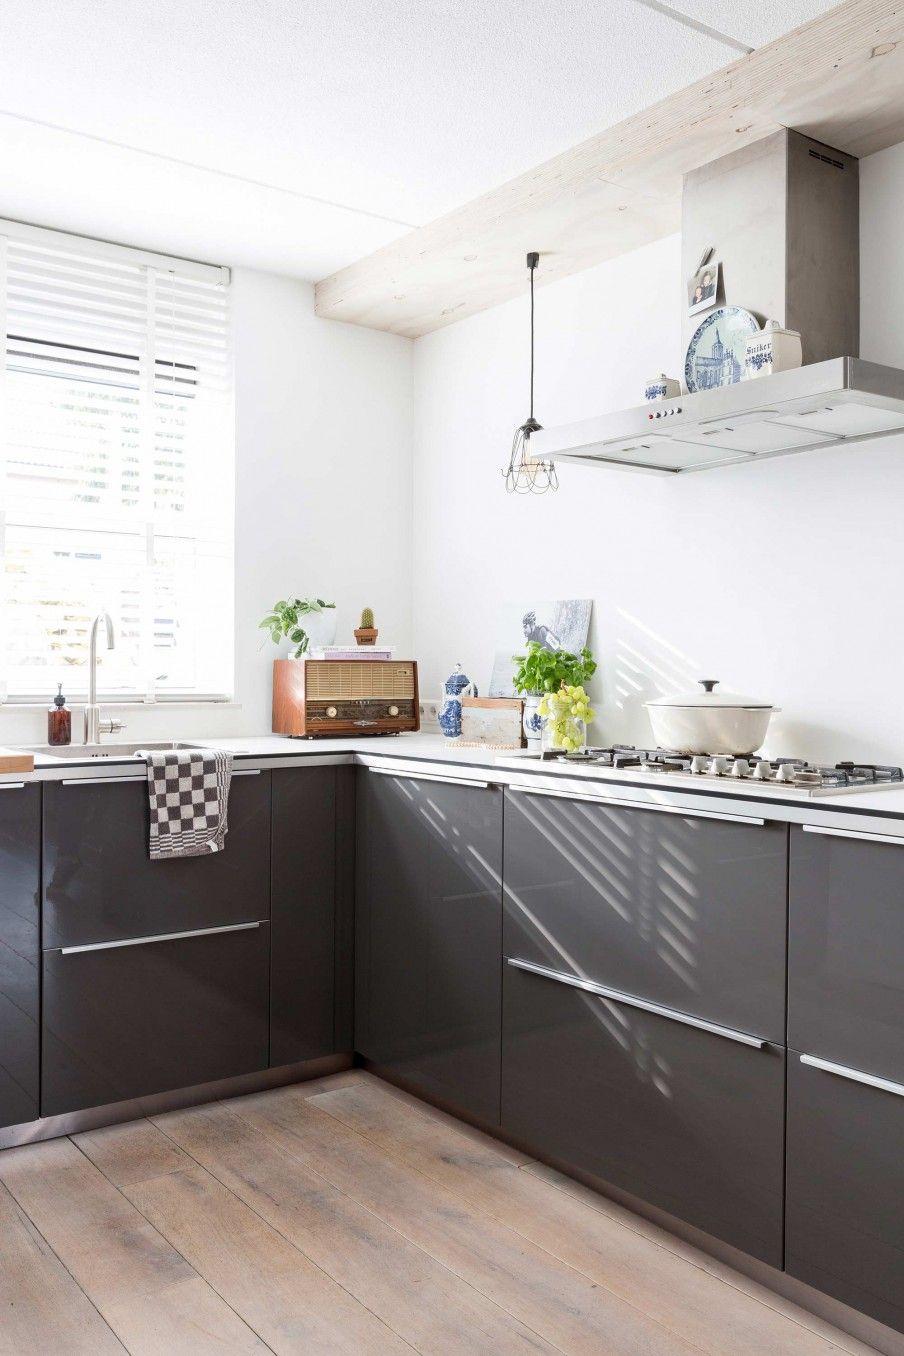 grijze keuken | grey kitchen | vtwonen 10-2016 | photography: Hans ...